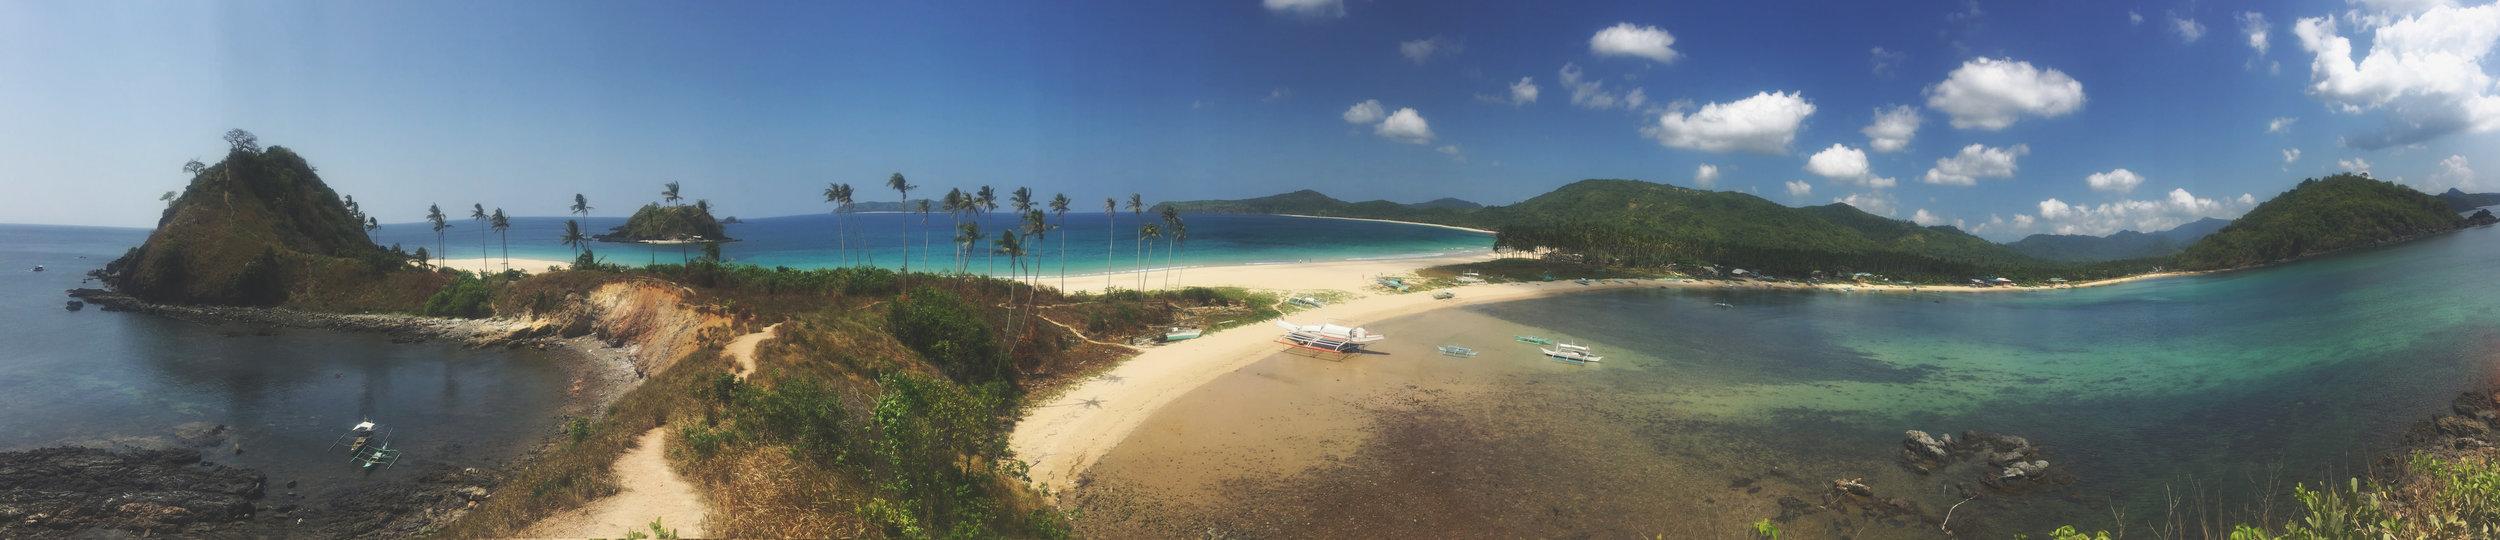 Nacpan Beach pano